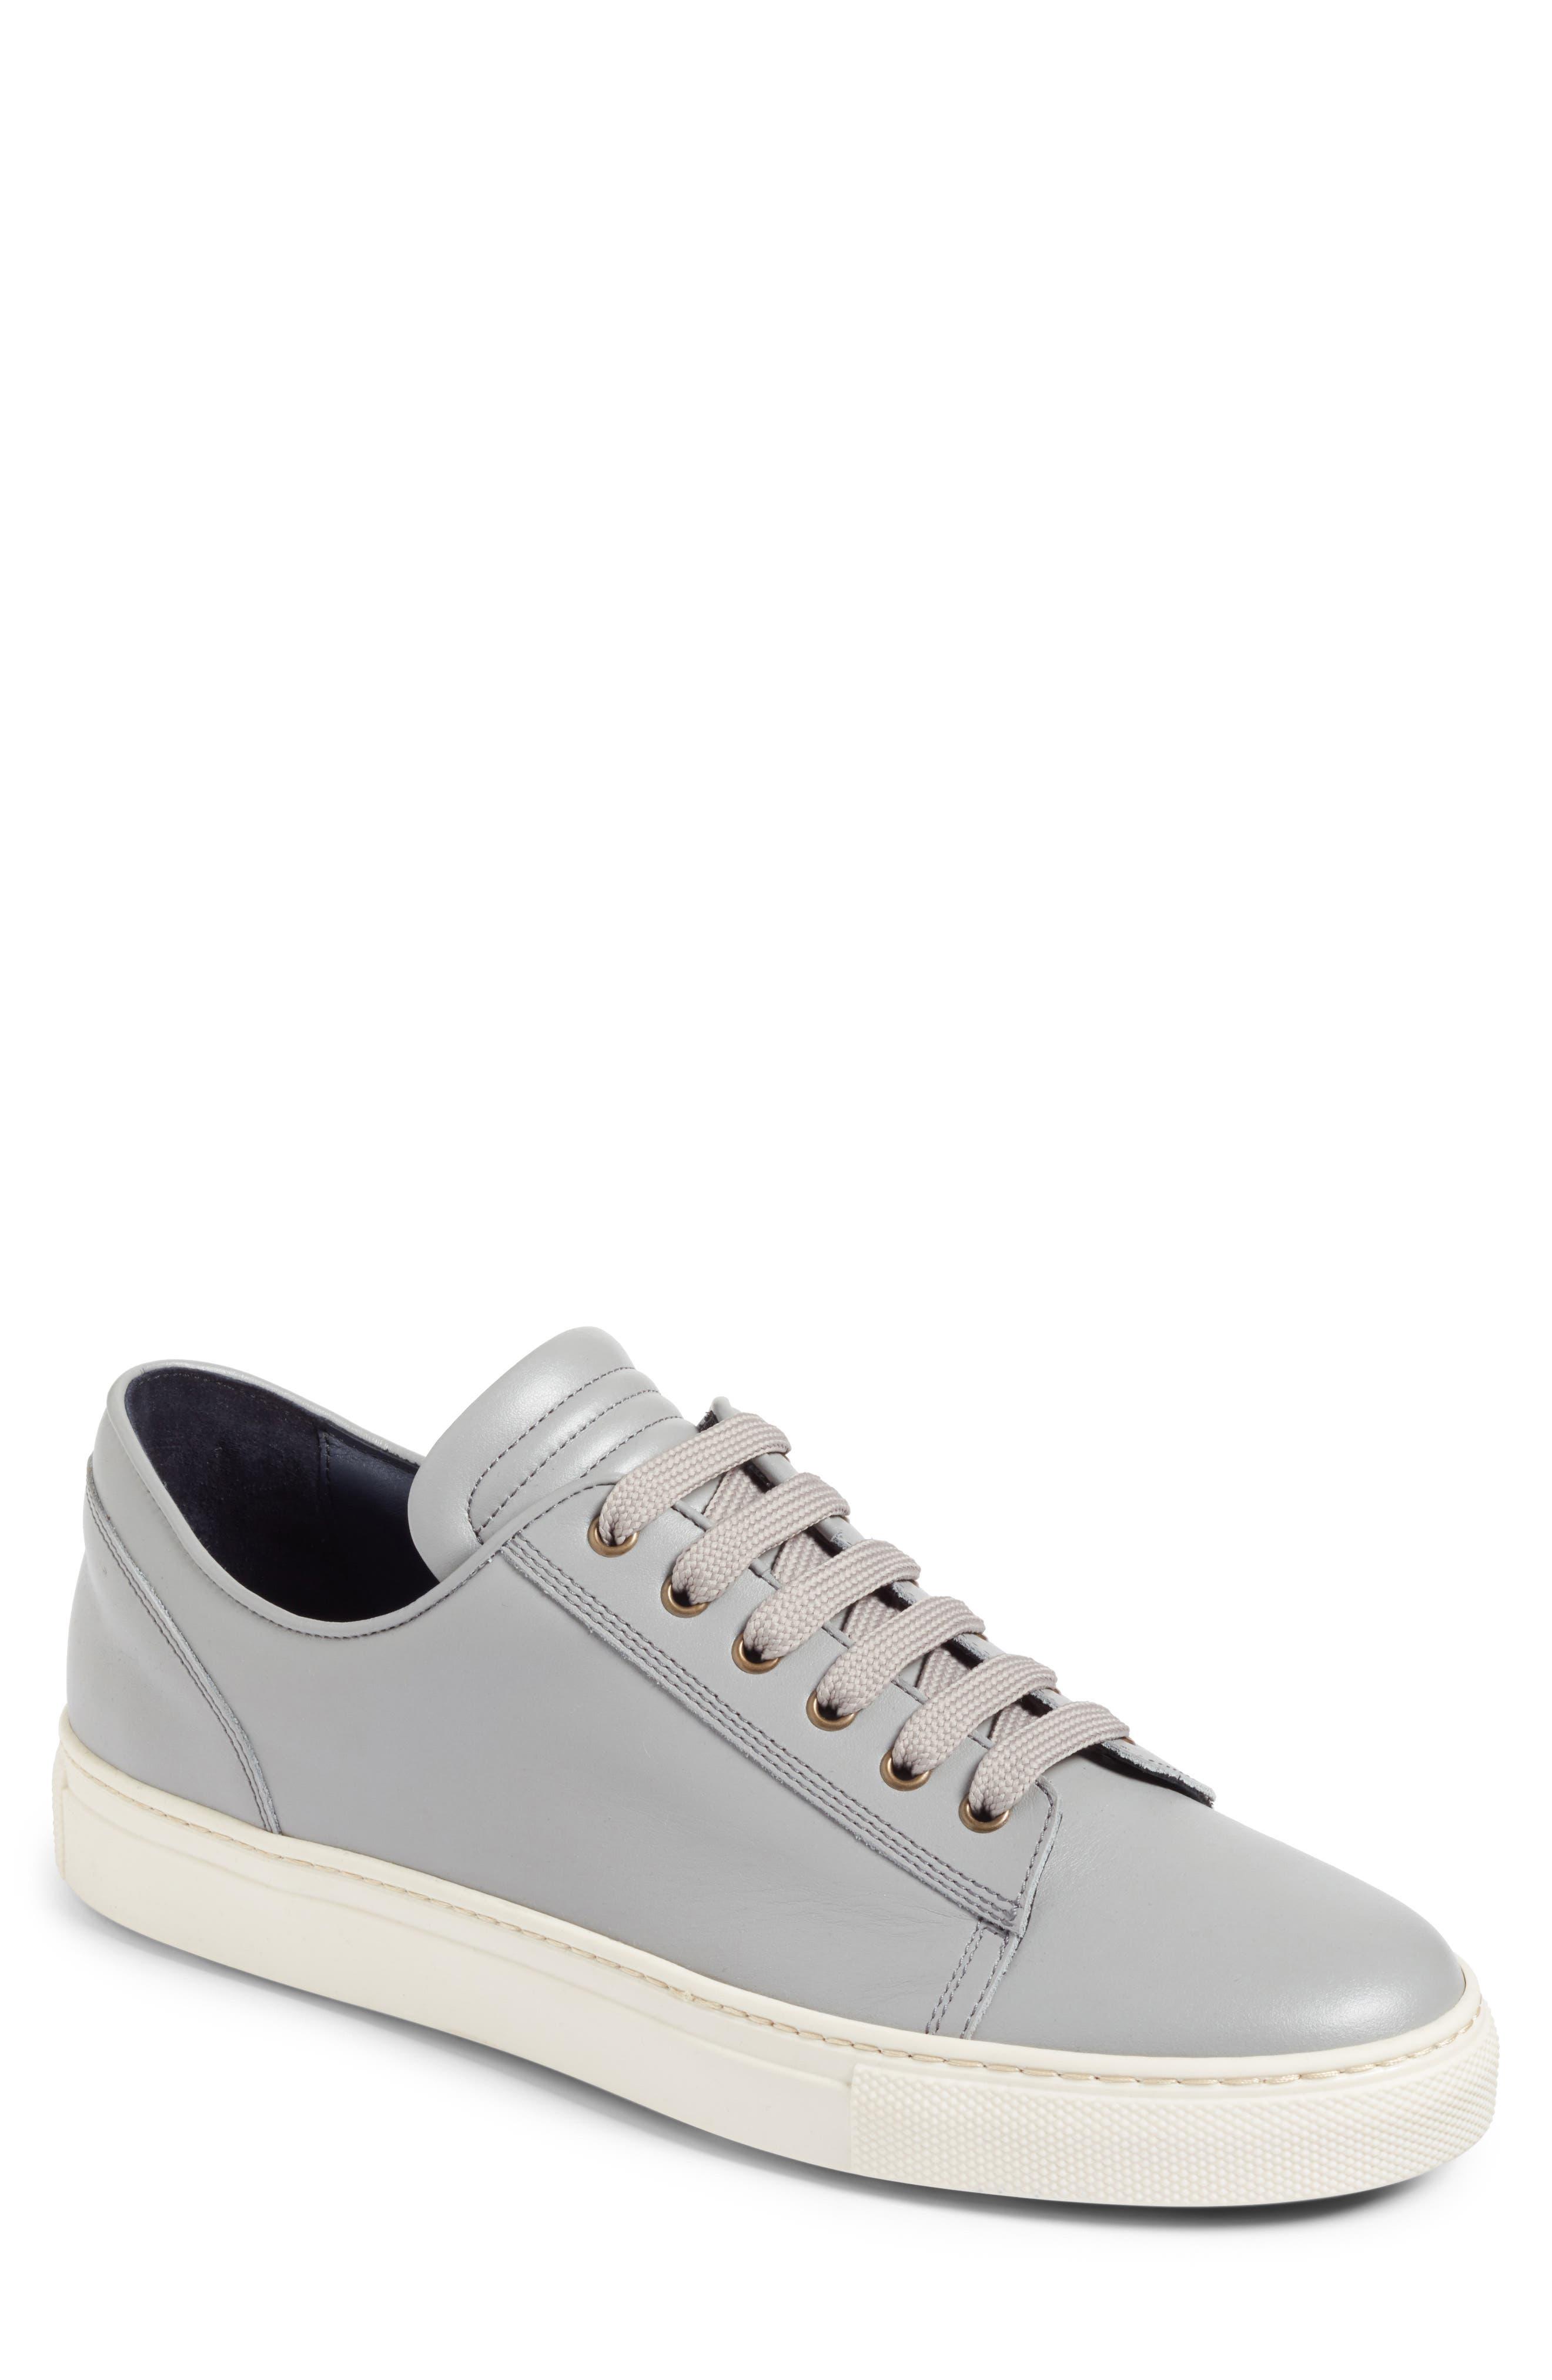 Taranto Sneaker,                         Main,                         color, 020